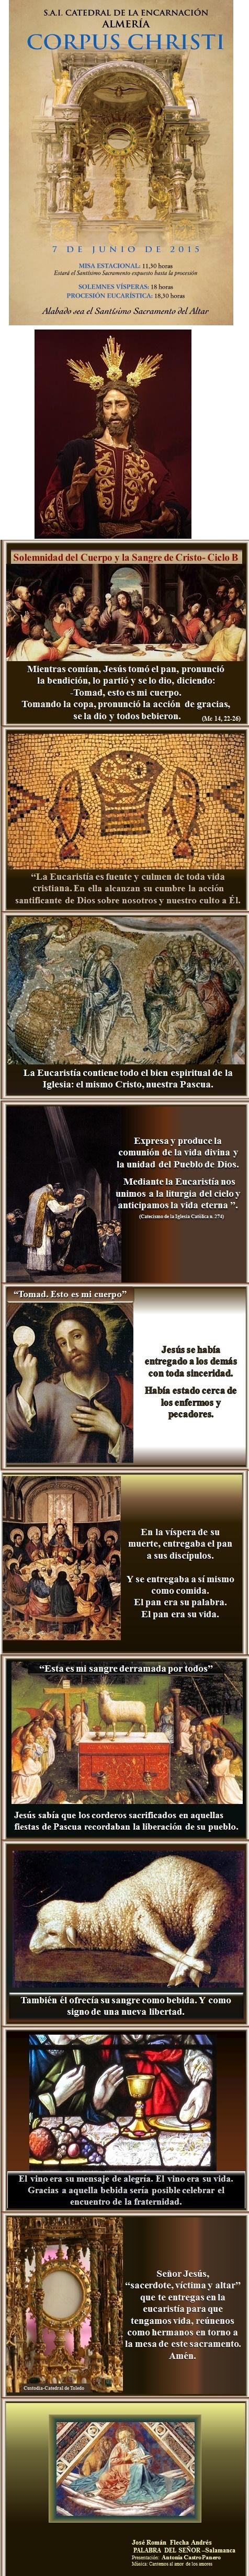 20150604092820-senor-de-la-santa-cena-con-powerpoint-eucaristico-.jpg